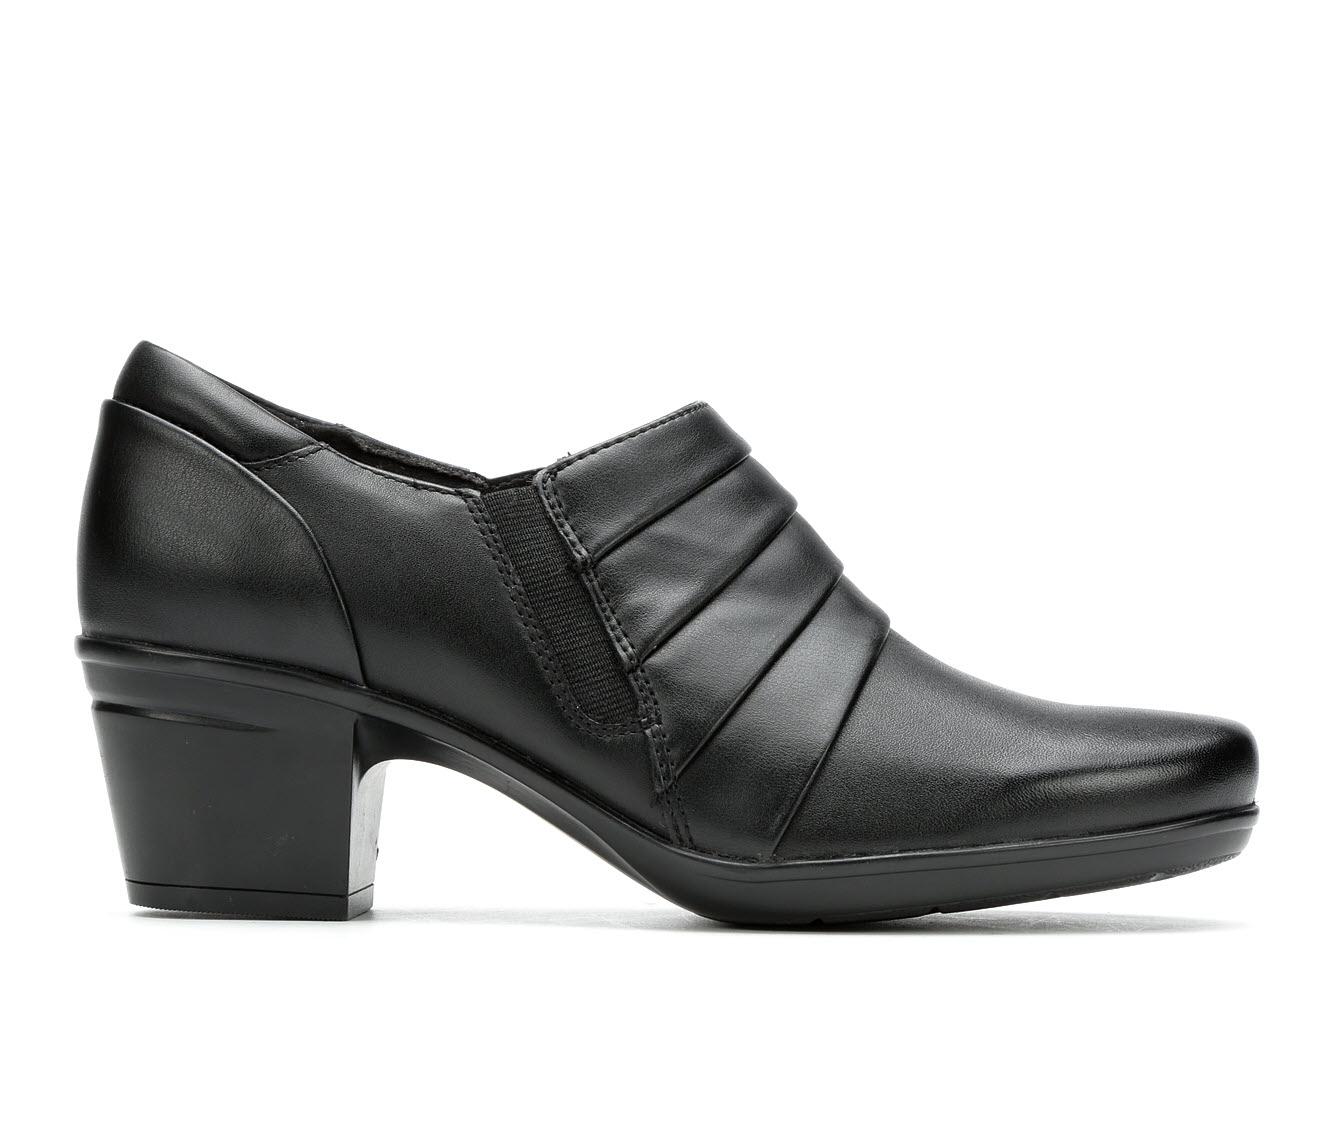 Clarks Emslie Guide Women's Shoe (Black Leather)